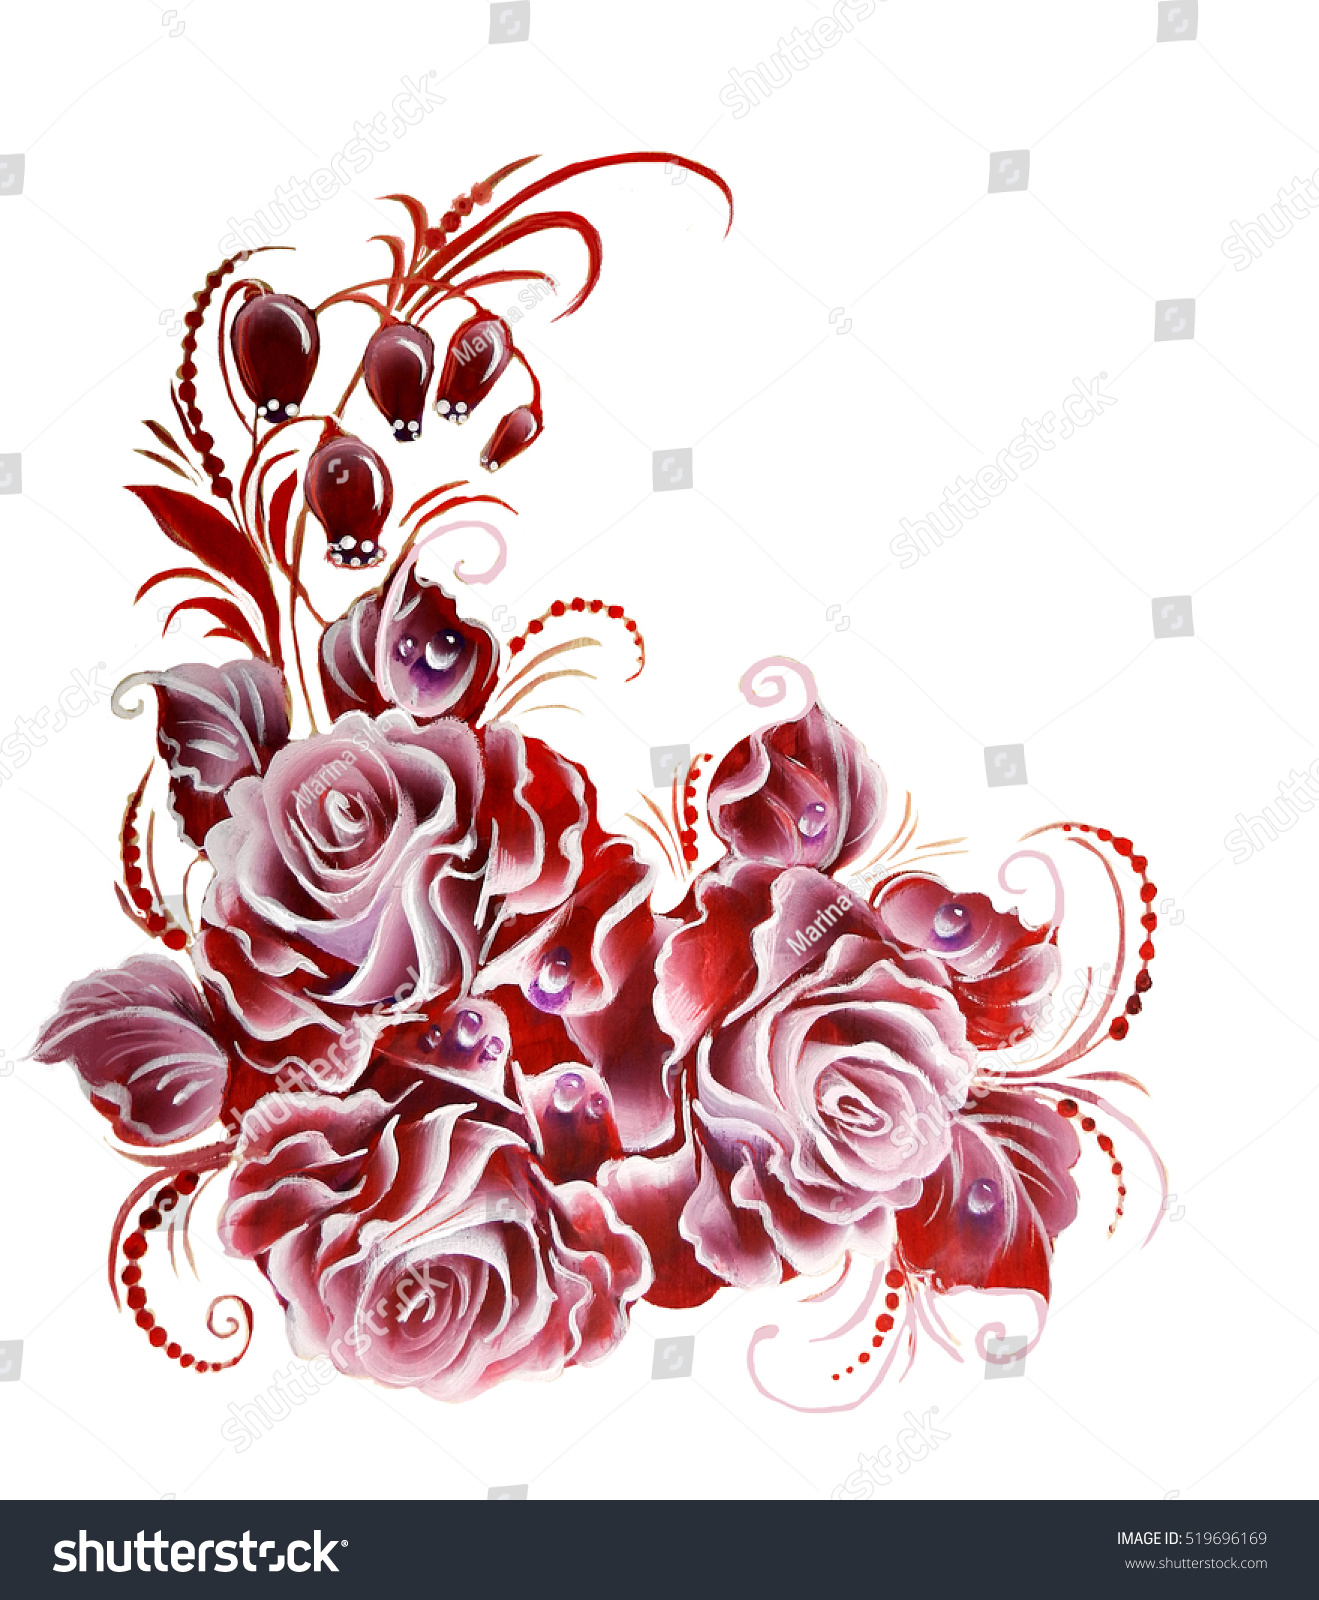 Flowers Rose One Stroke Painting Stock Illustration 519696169 ...